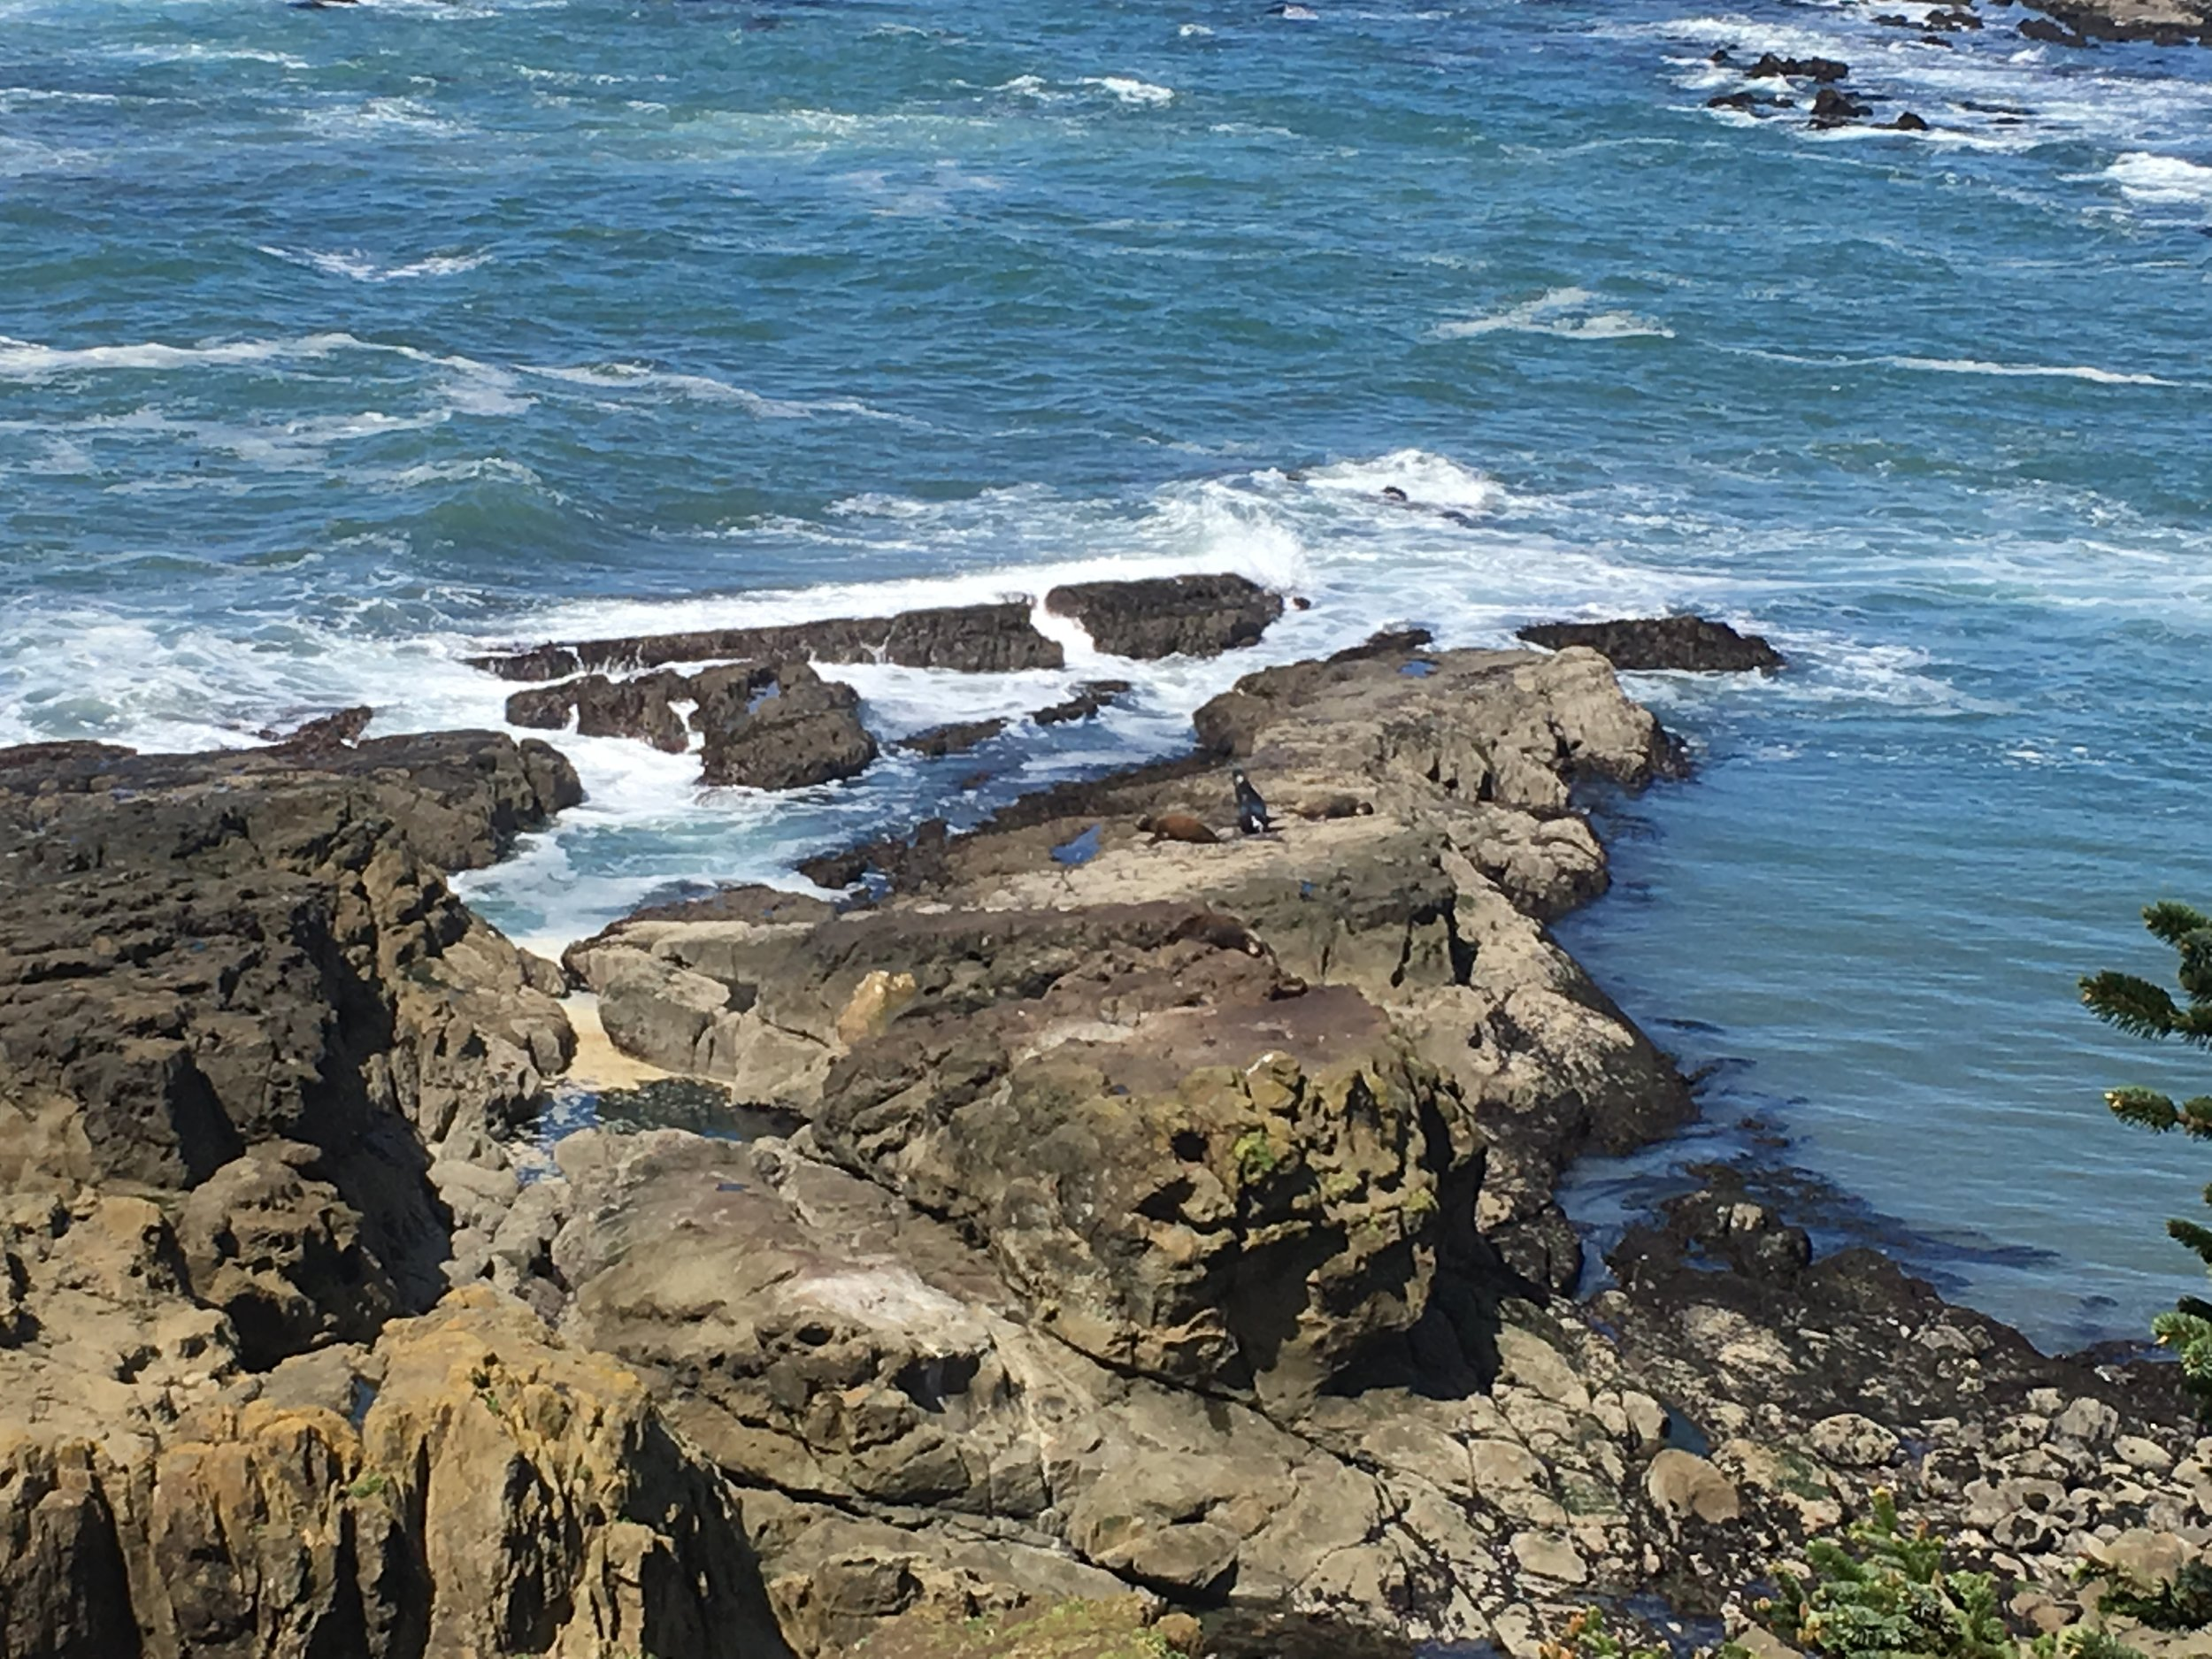 Cape Arago. Can you spot the huge sea lions?